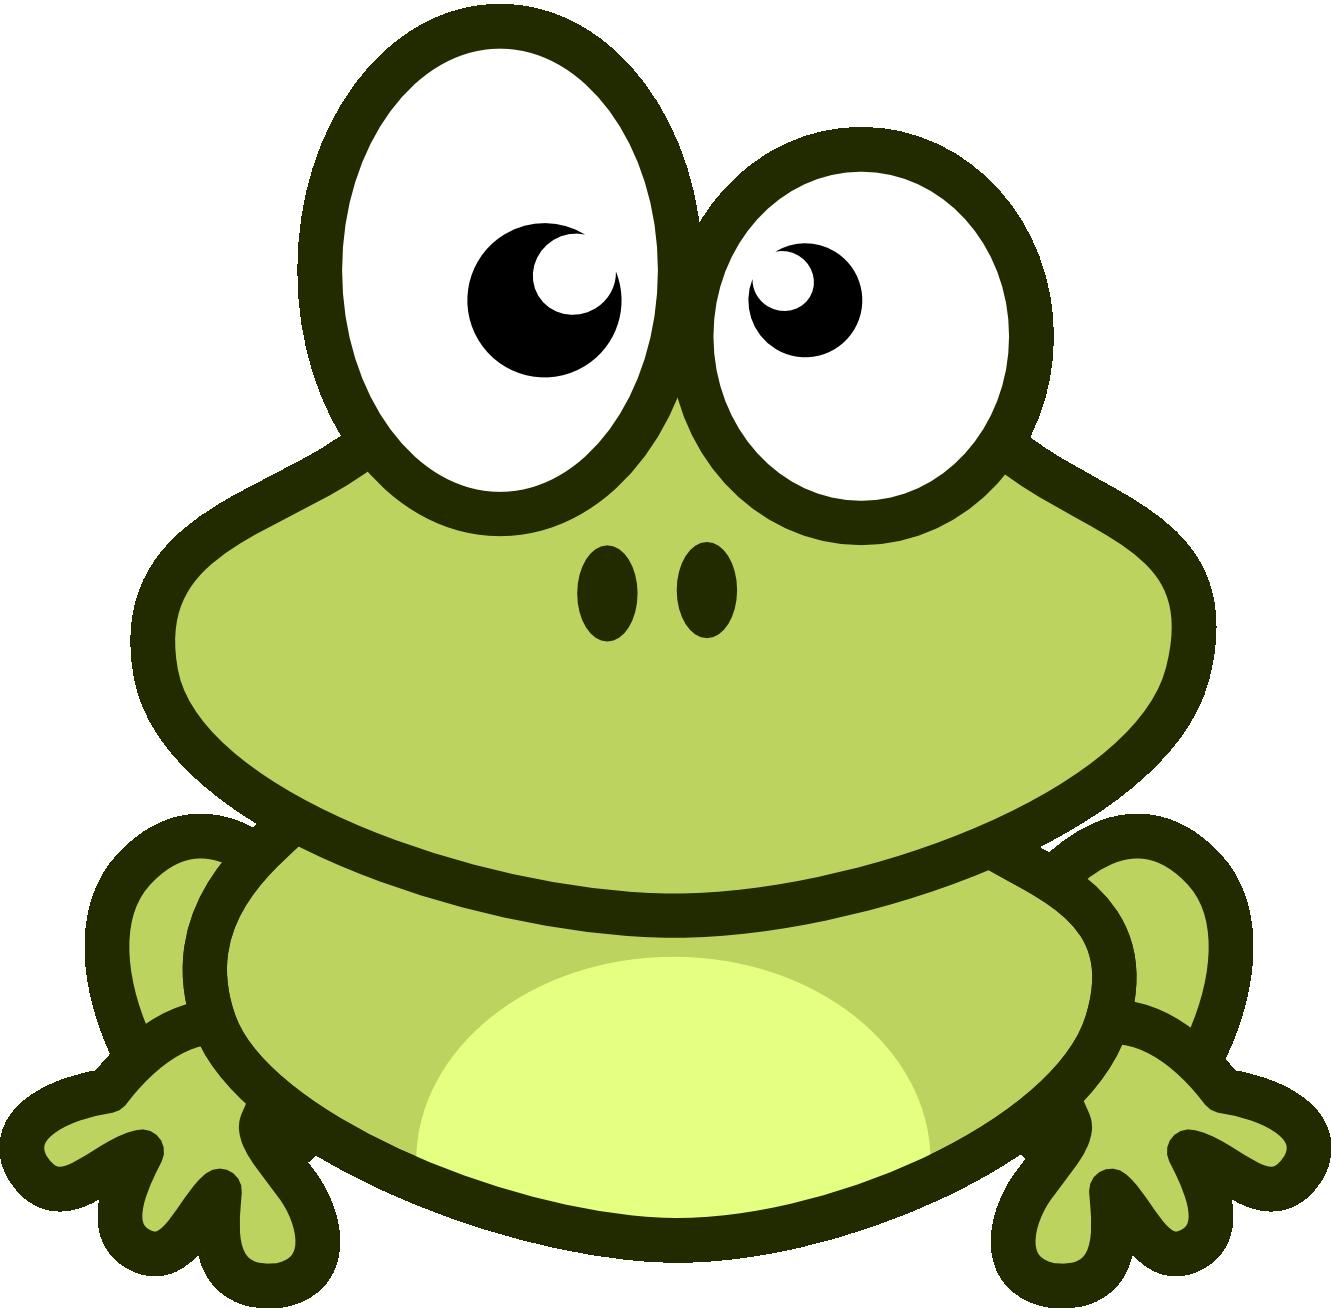 frog clip art cartoon clipart panda free clipart images rh clipartpanda com cartoon frog clipart free